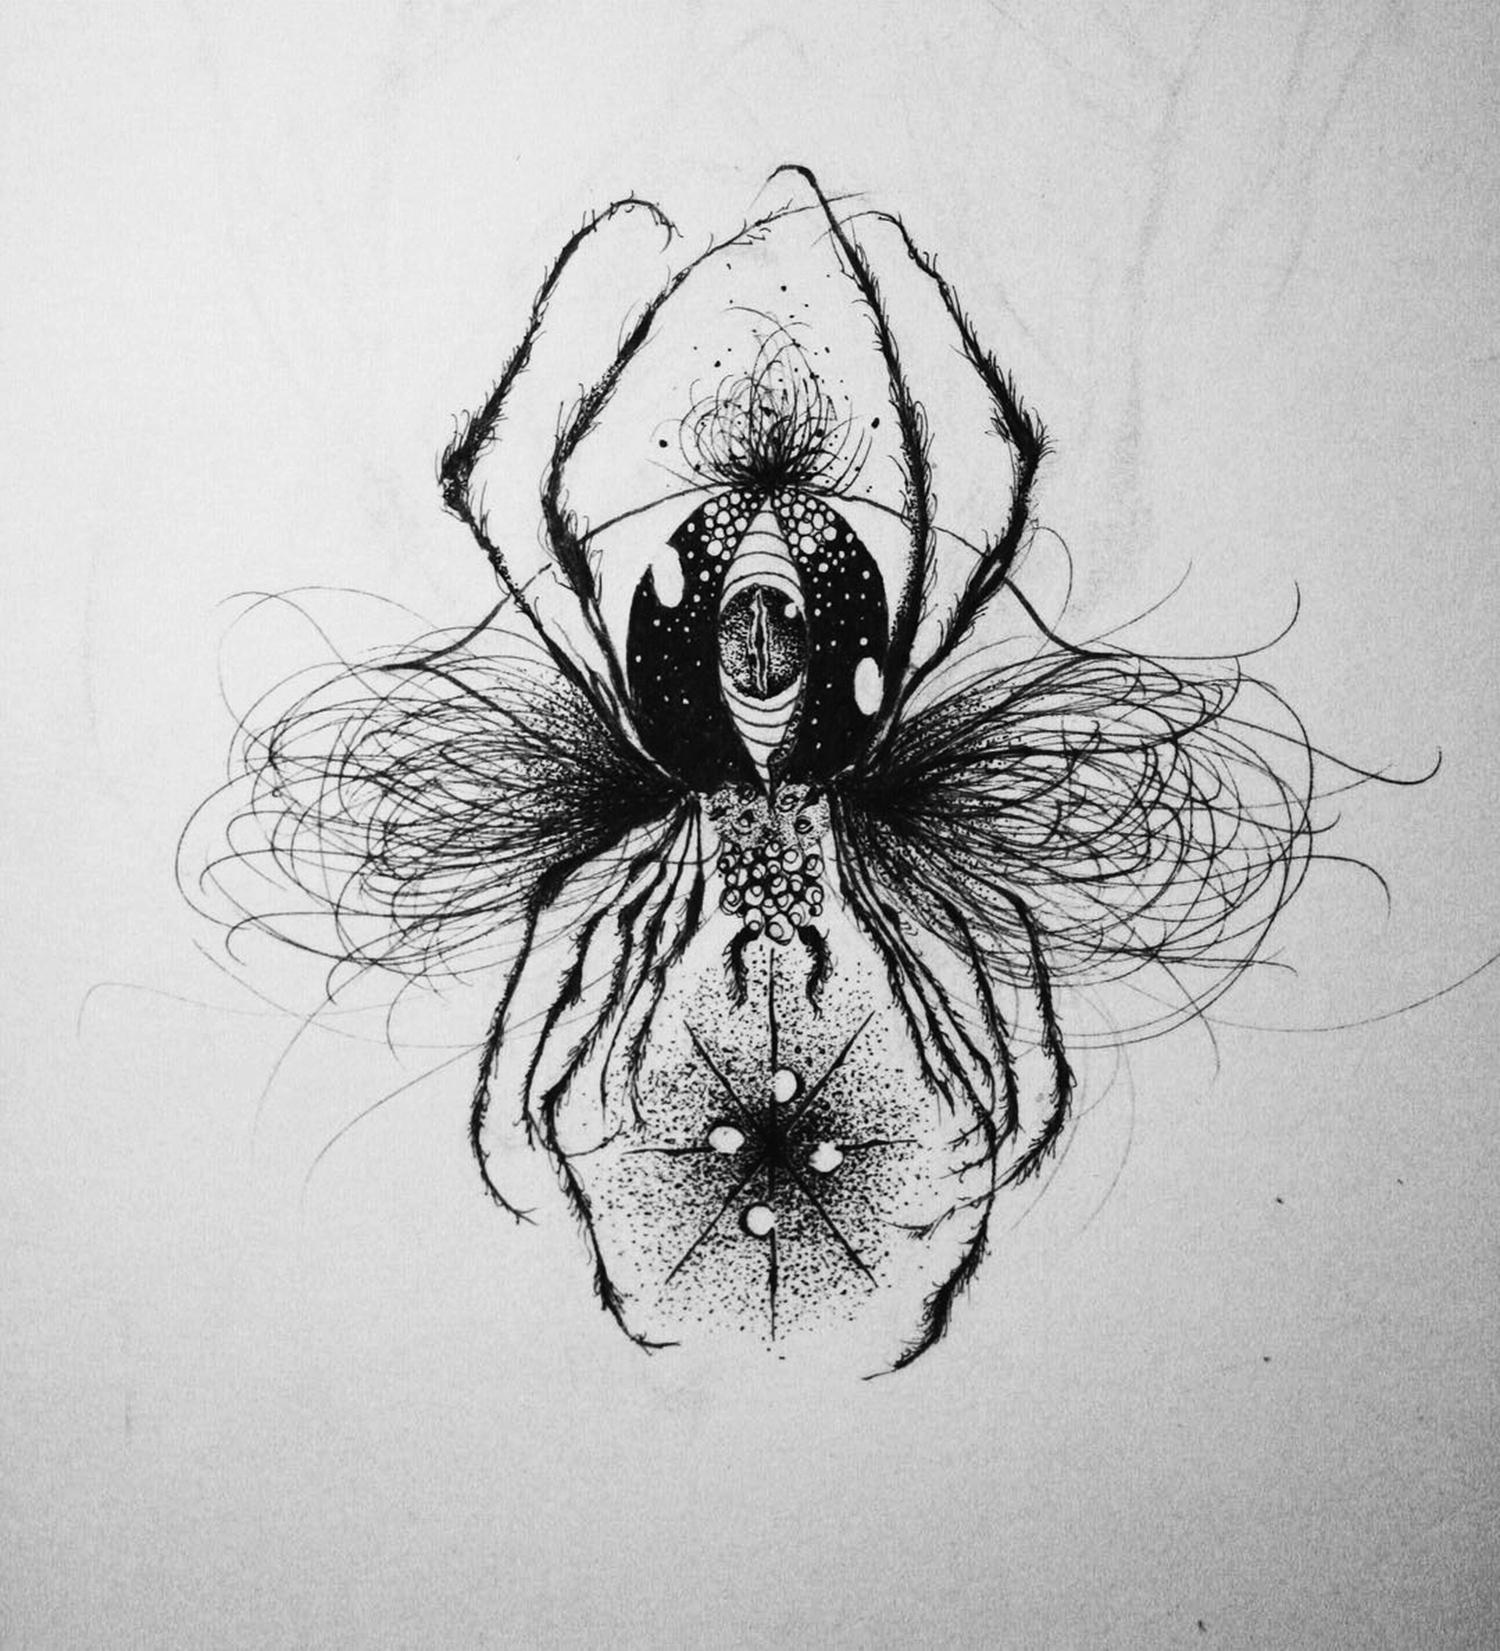 Suhwan Bak - Goth Gloomy tattoo - spider